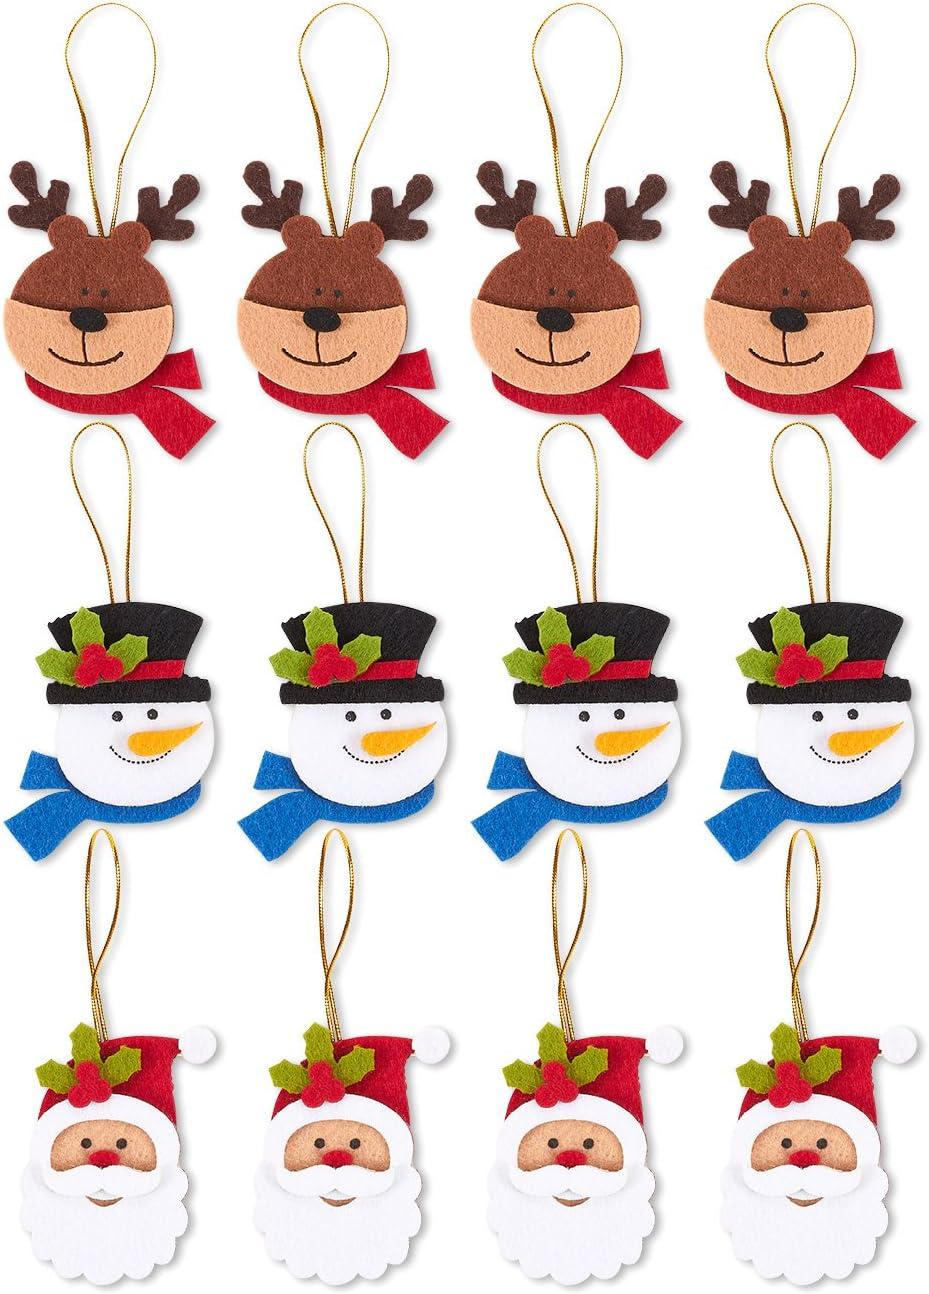 Felt Christmas Tree Ornaments, Reindeer, Santa Claus, and Snowman (12 Pack)